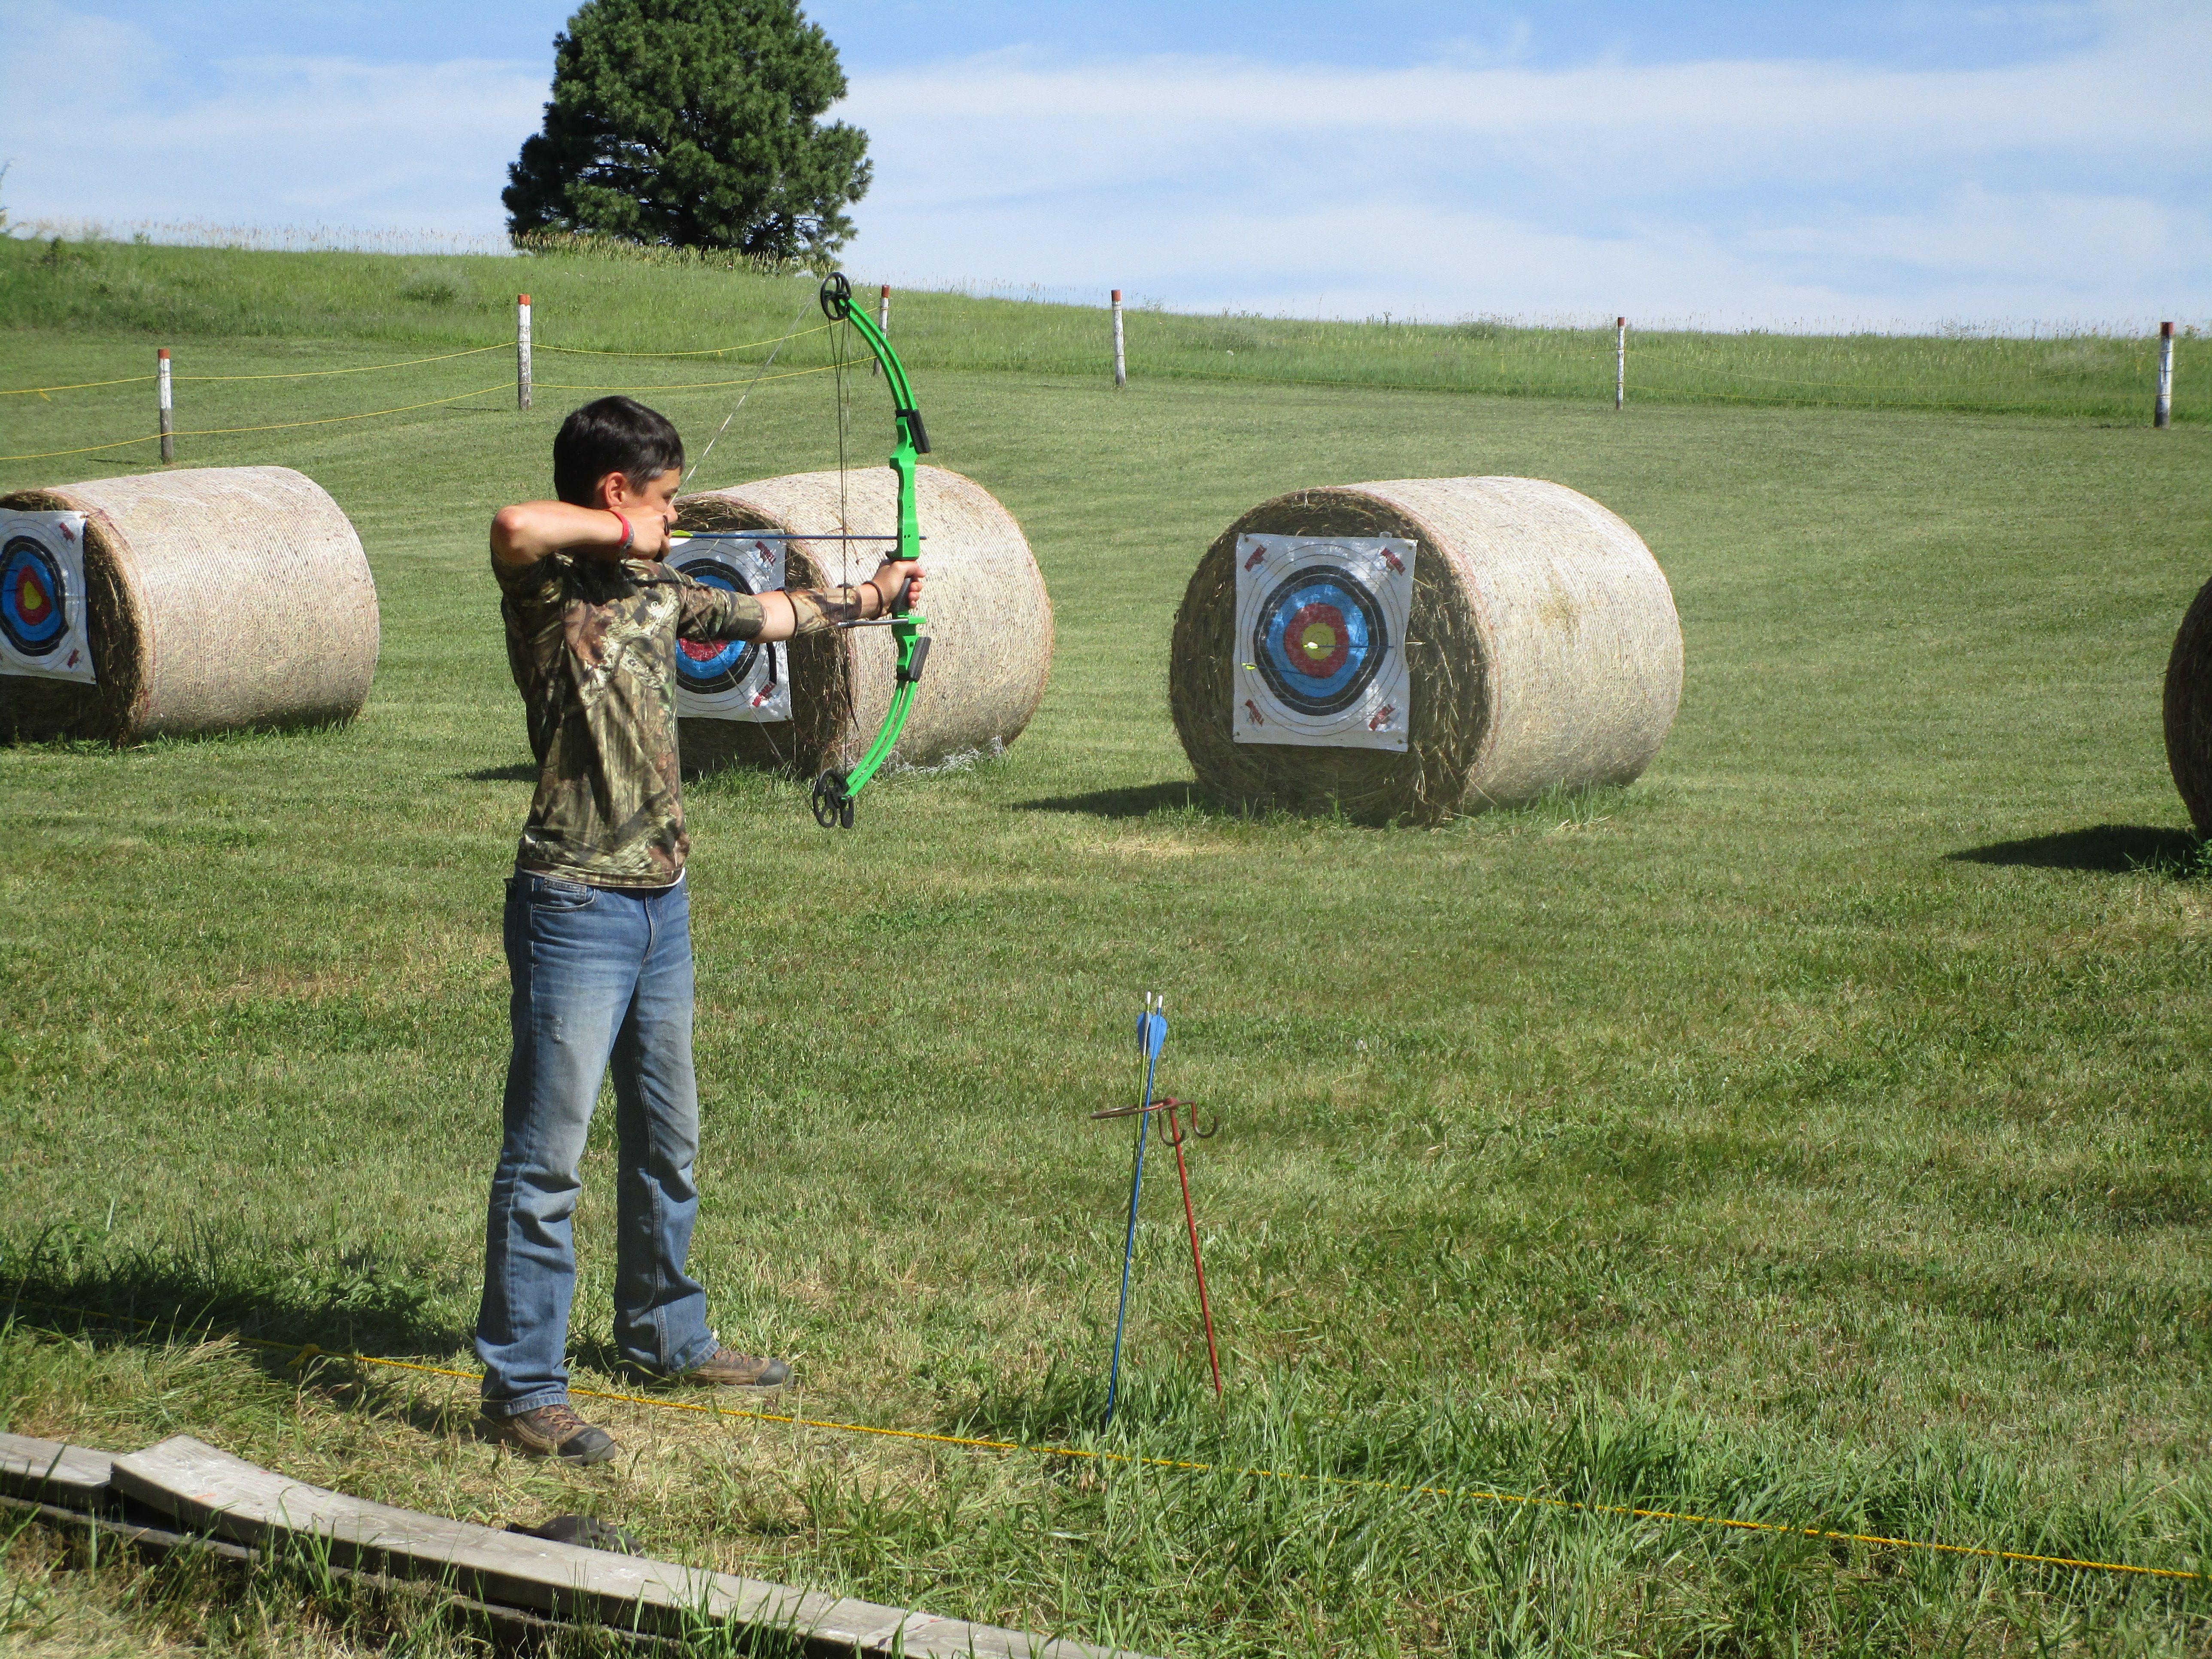 Cub Scout BB Gun/Archery Range Master Training